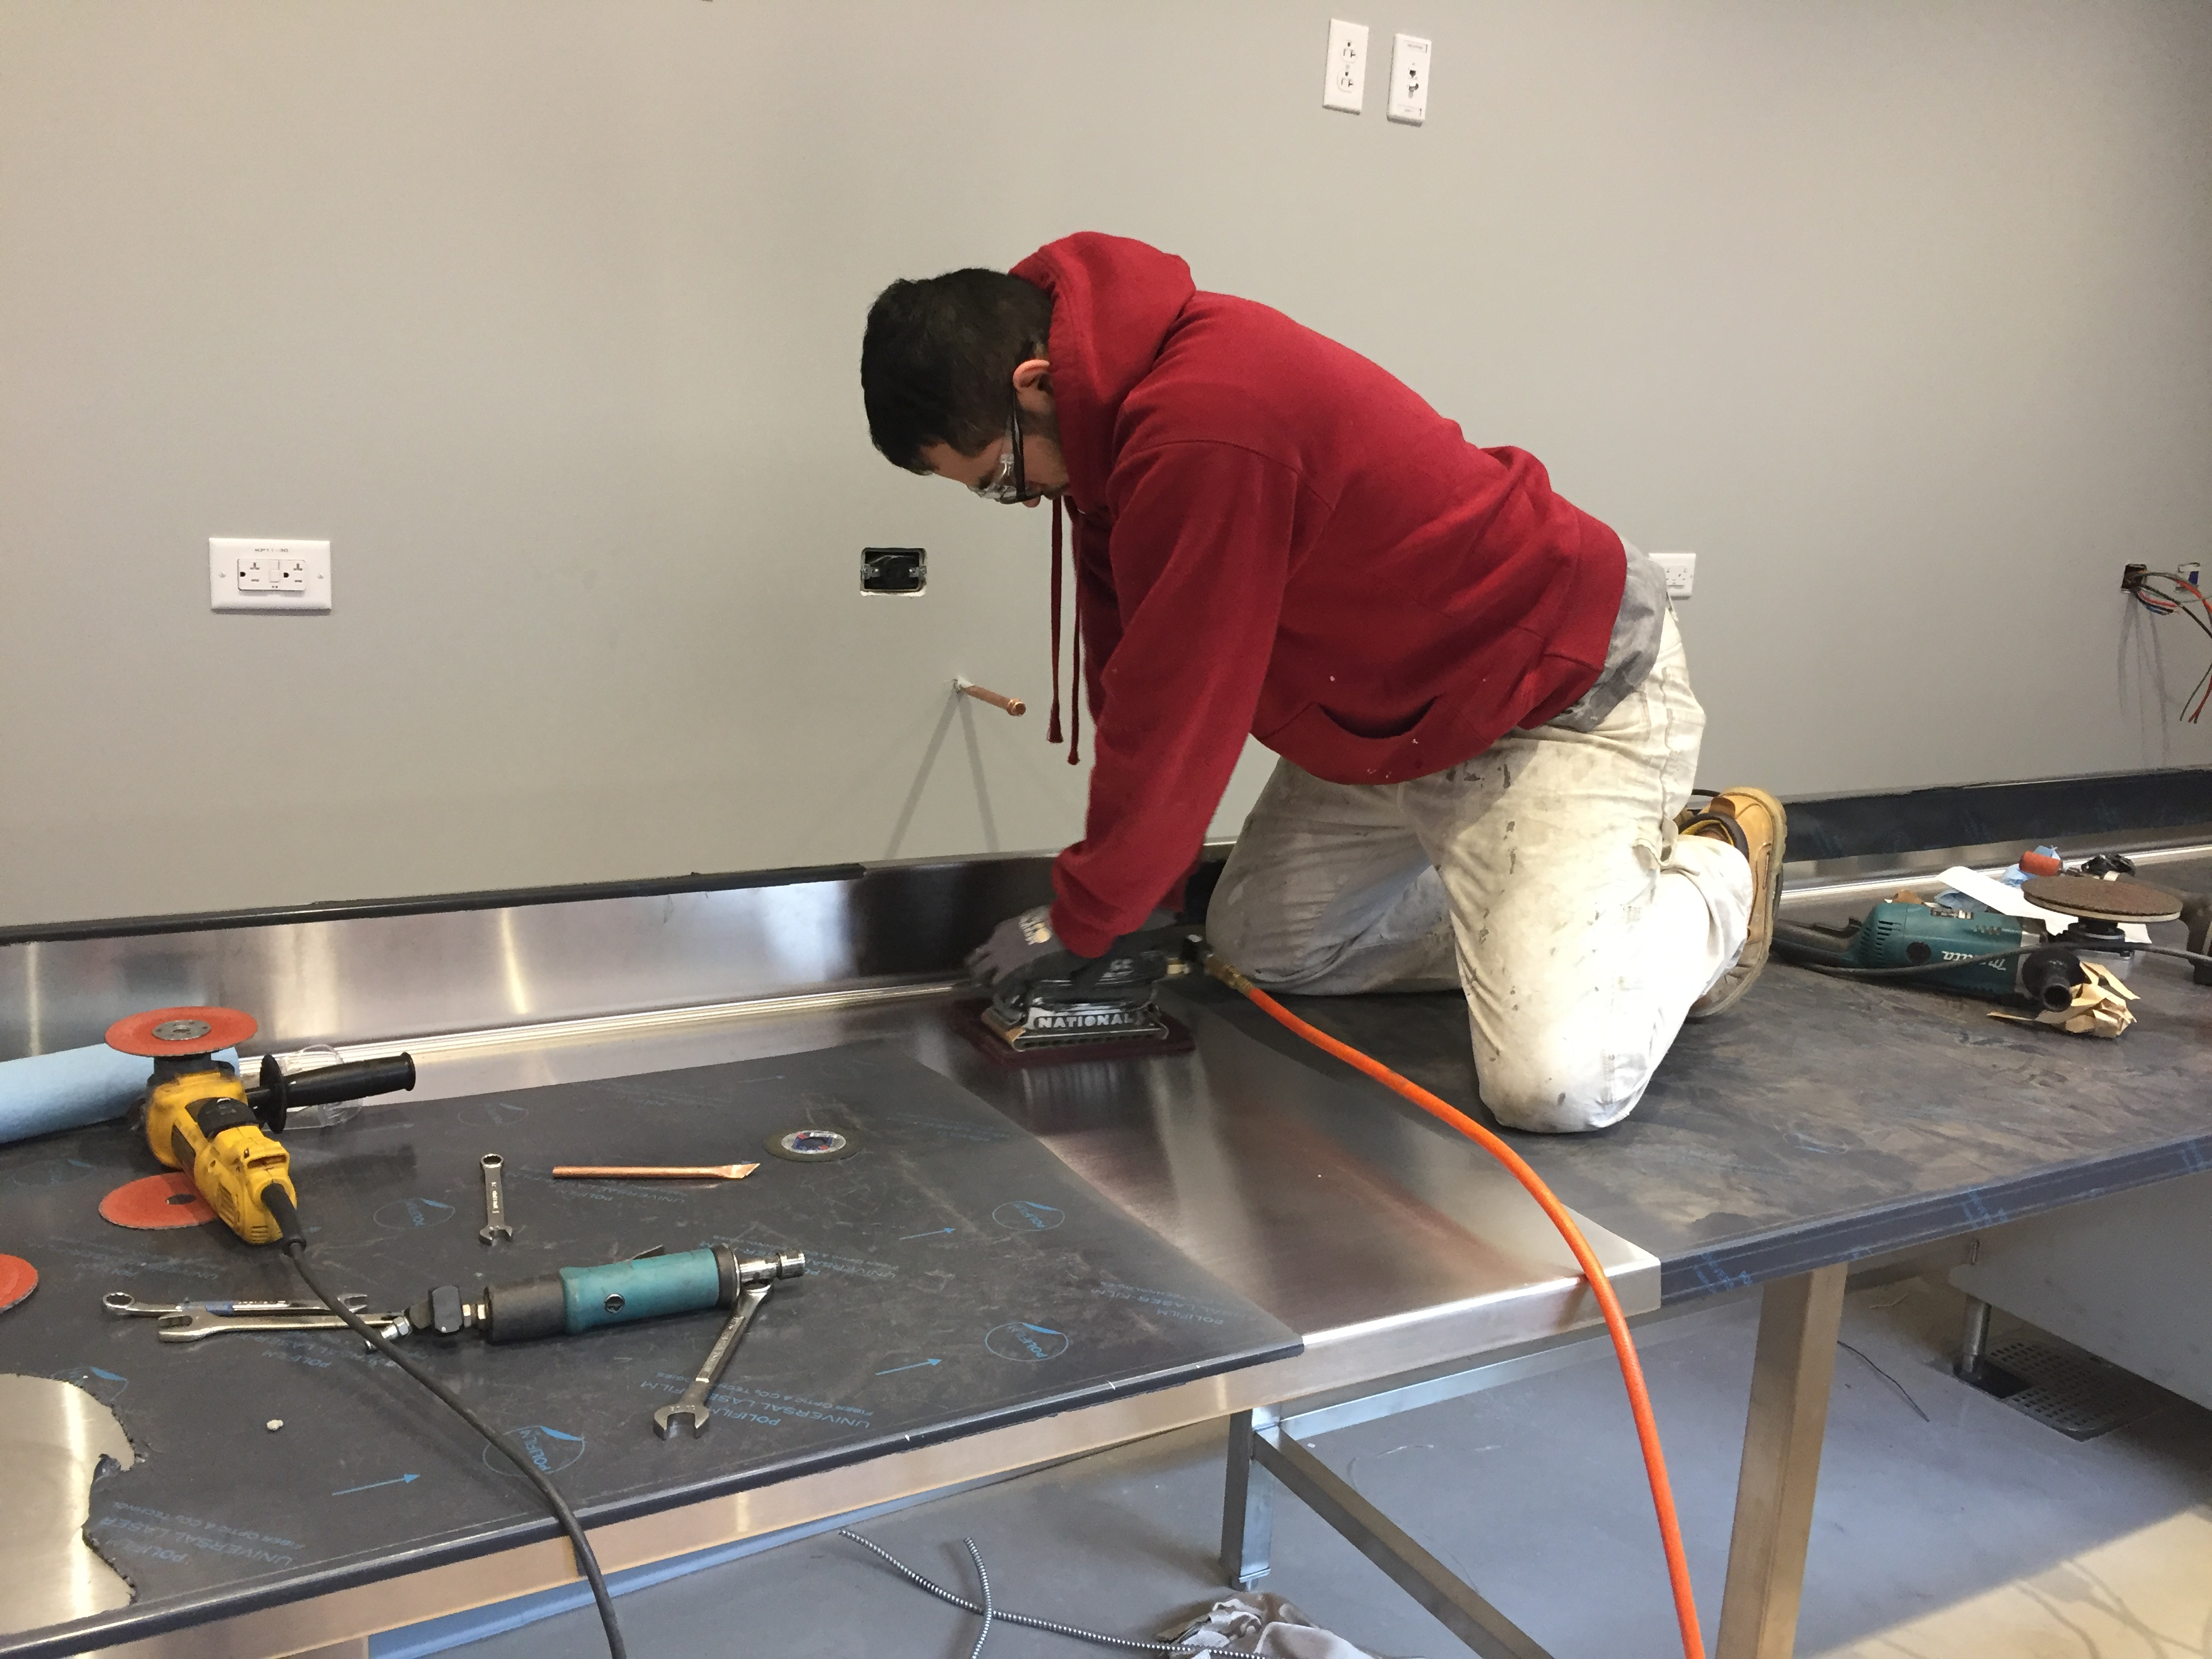 Kitchen Equipment Installation - JCK Welding, LLC. 65 Lake St. Shrewsbury, MA 01545